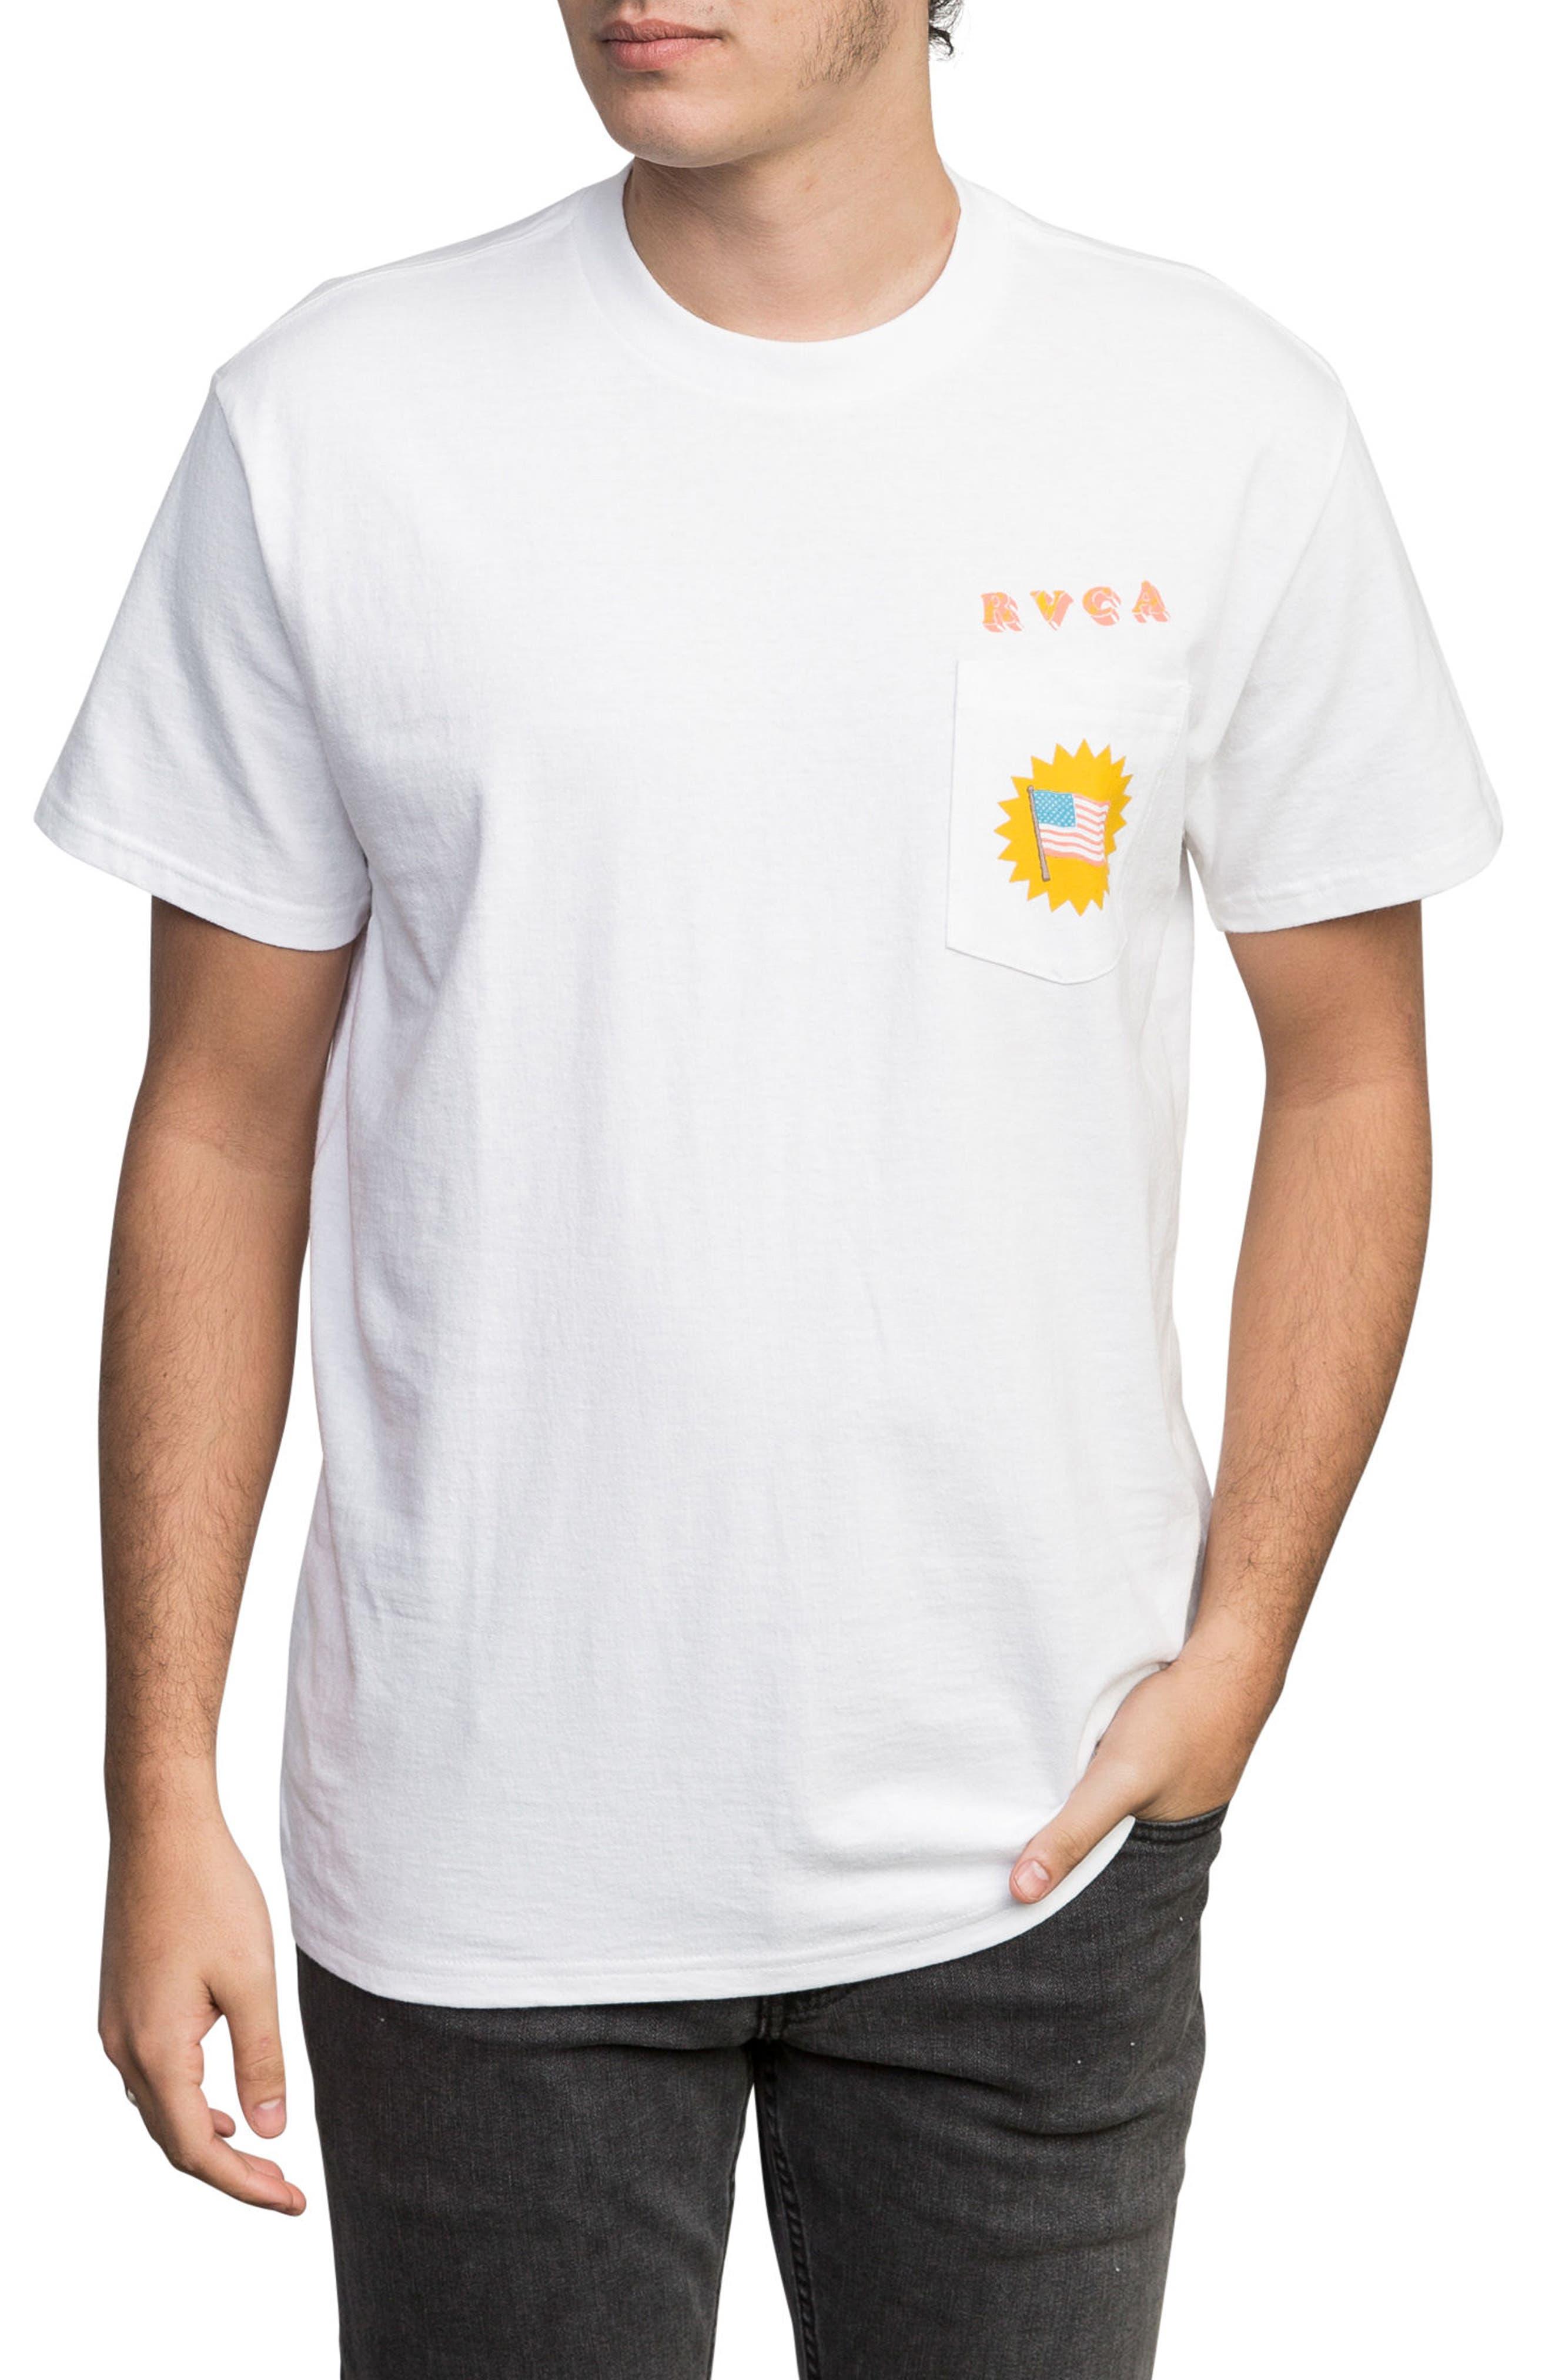 Luke Pelletier Blue Panther T-Shirt,                             Main thumbnail 1, color,                             White